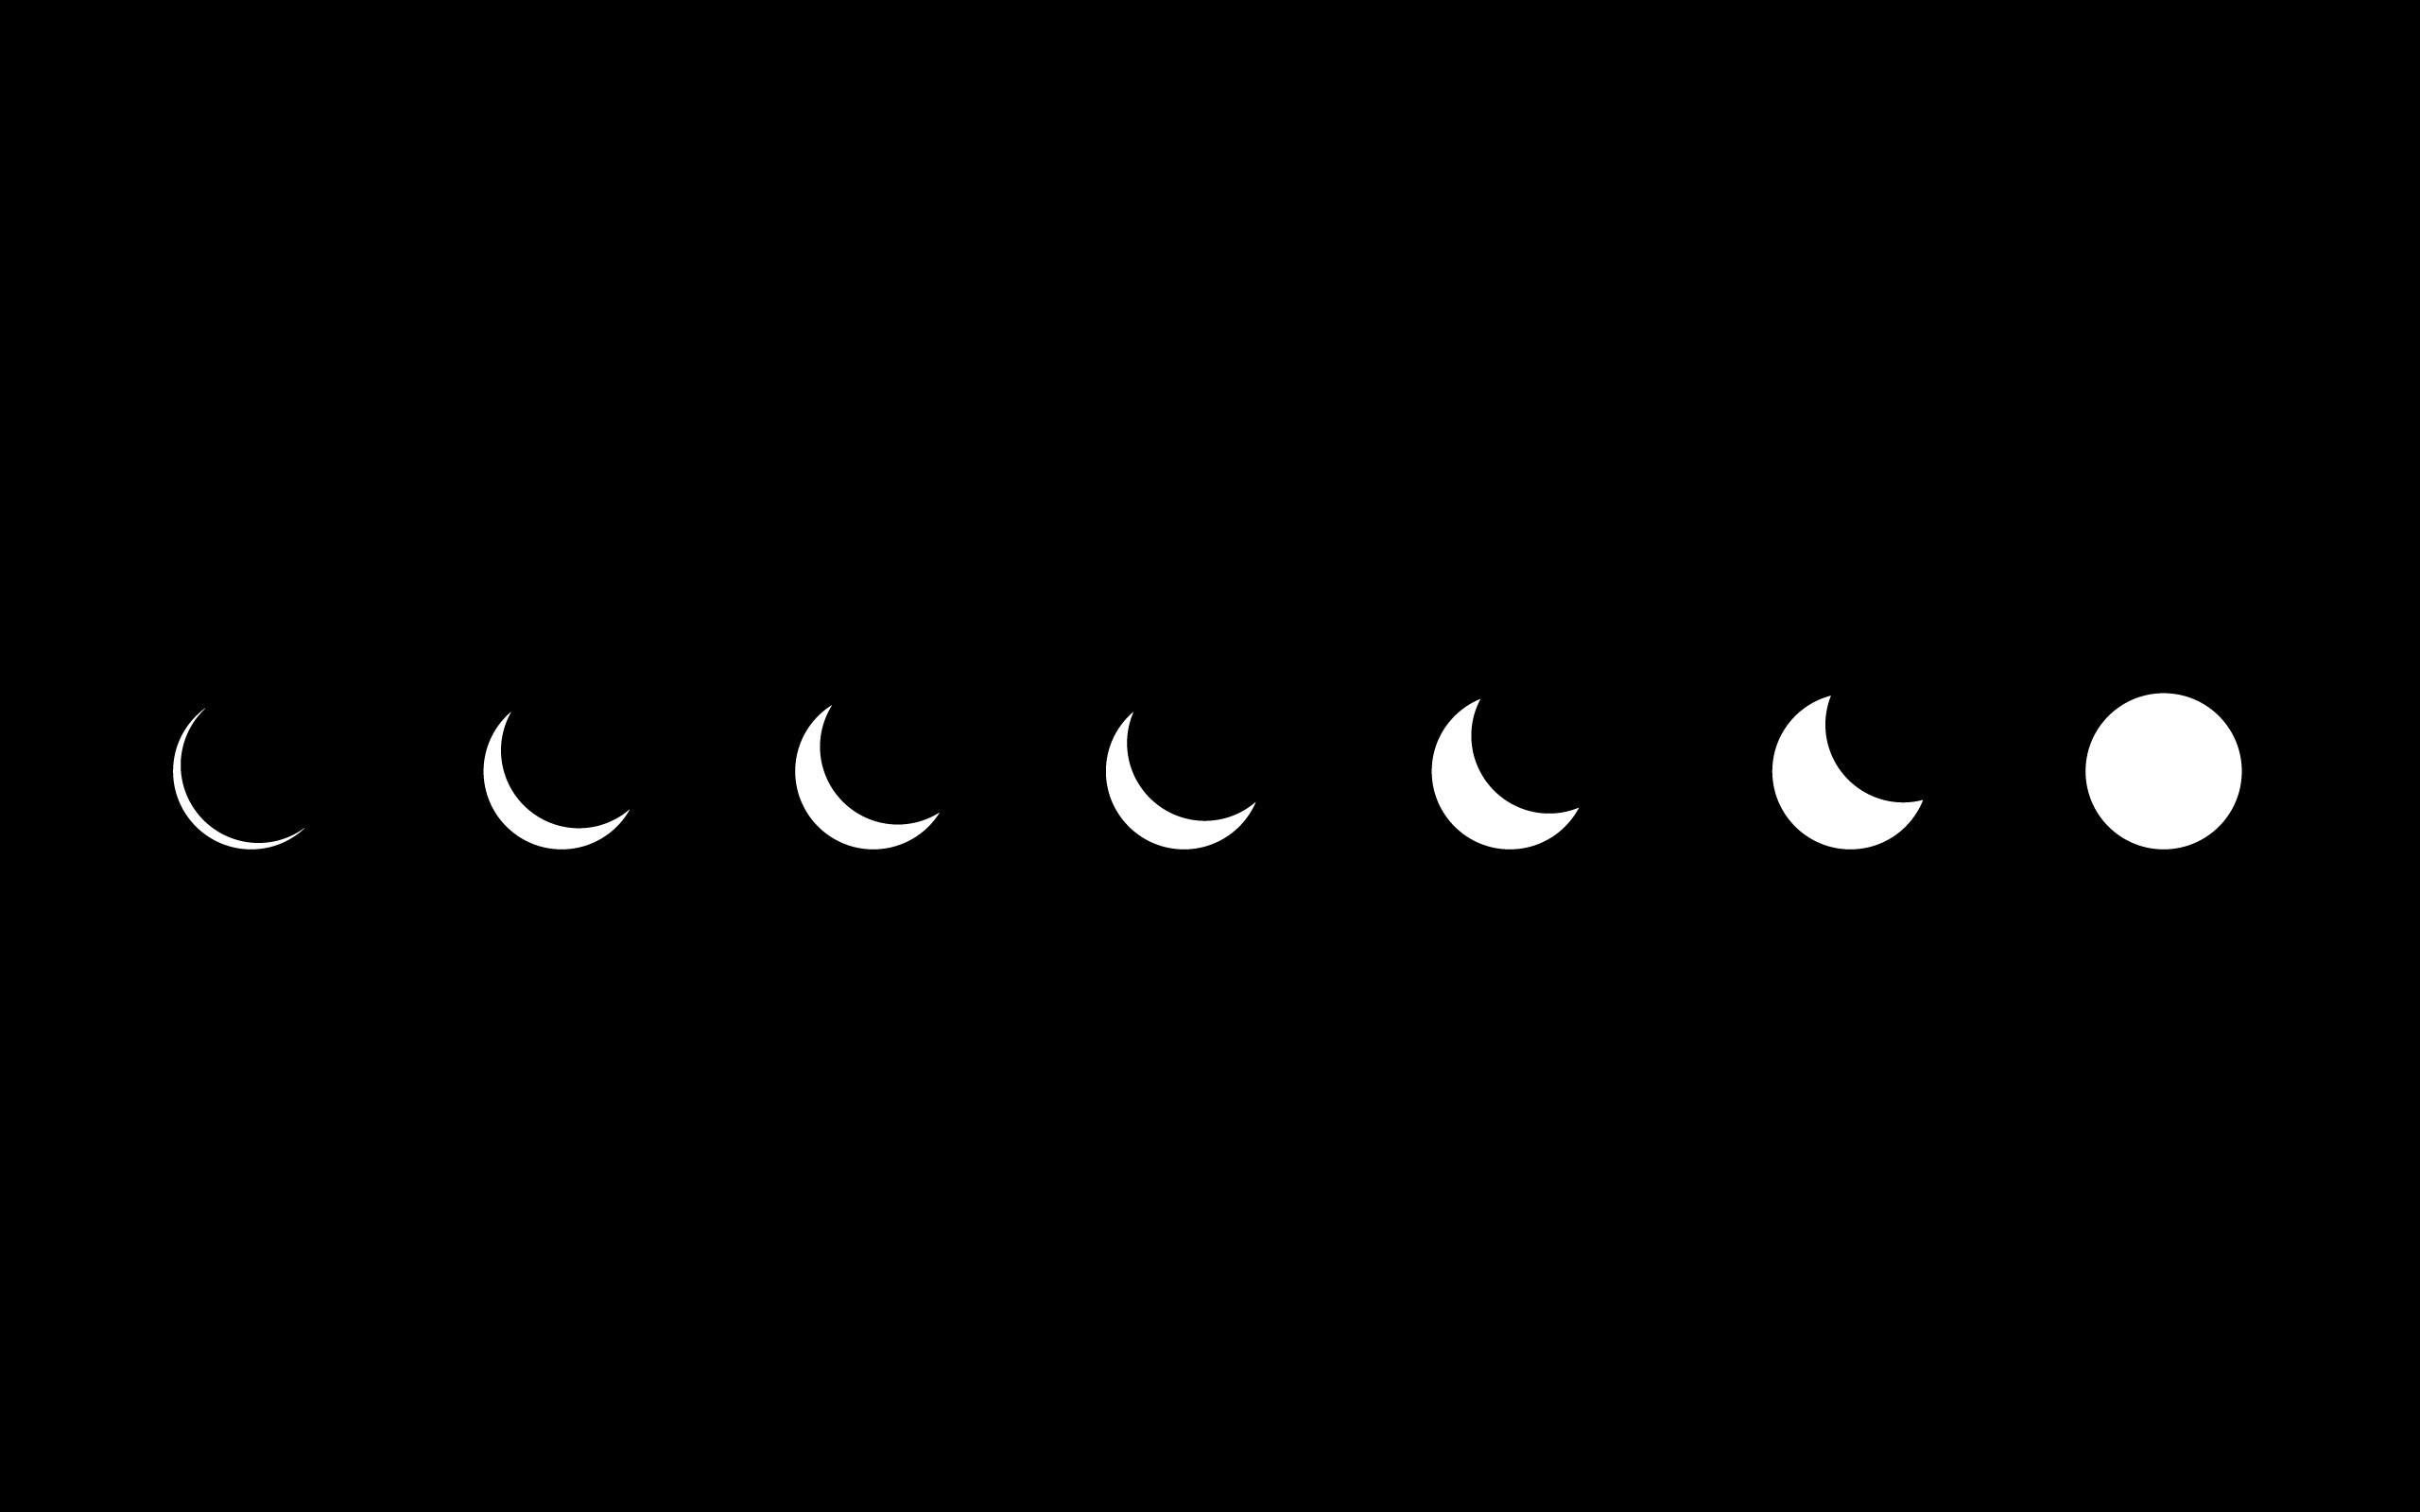 High Resolution Minimalistic Eclipse Artwork Simple HD Wallpaper